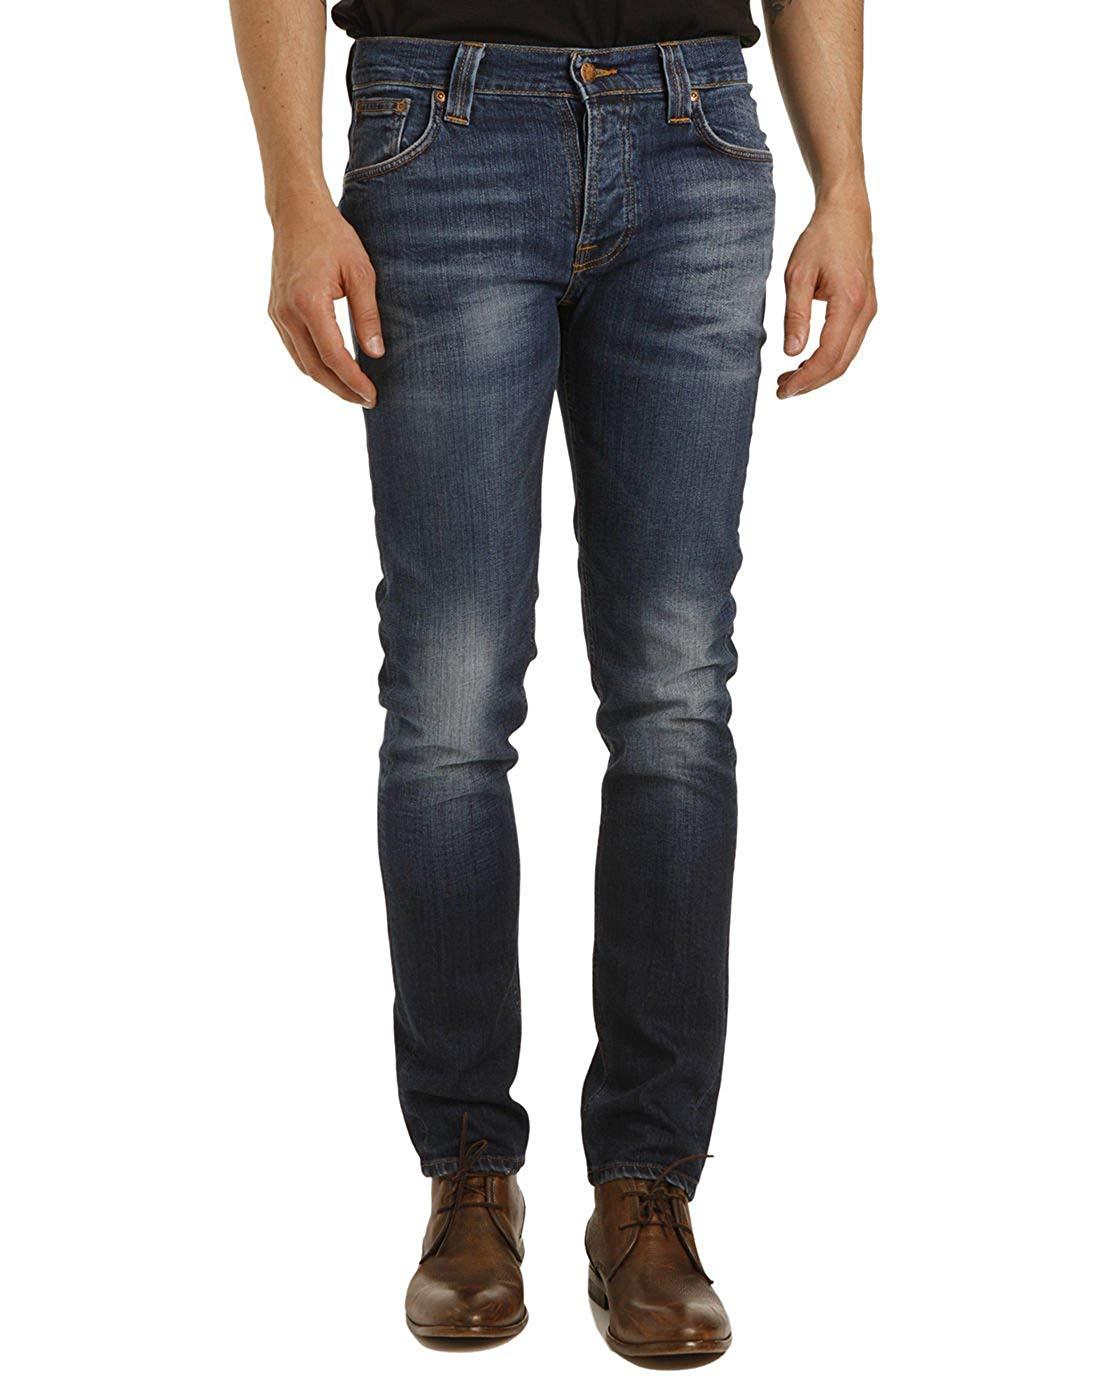 57b68e9fc8 Get Quotations · NUDIE JEANS Men s Cold Crisp Grim Tim Organic Slim Fit  Jeans